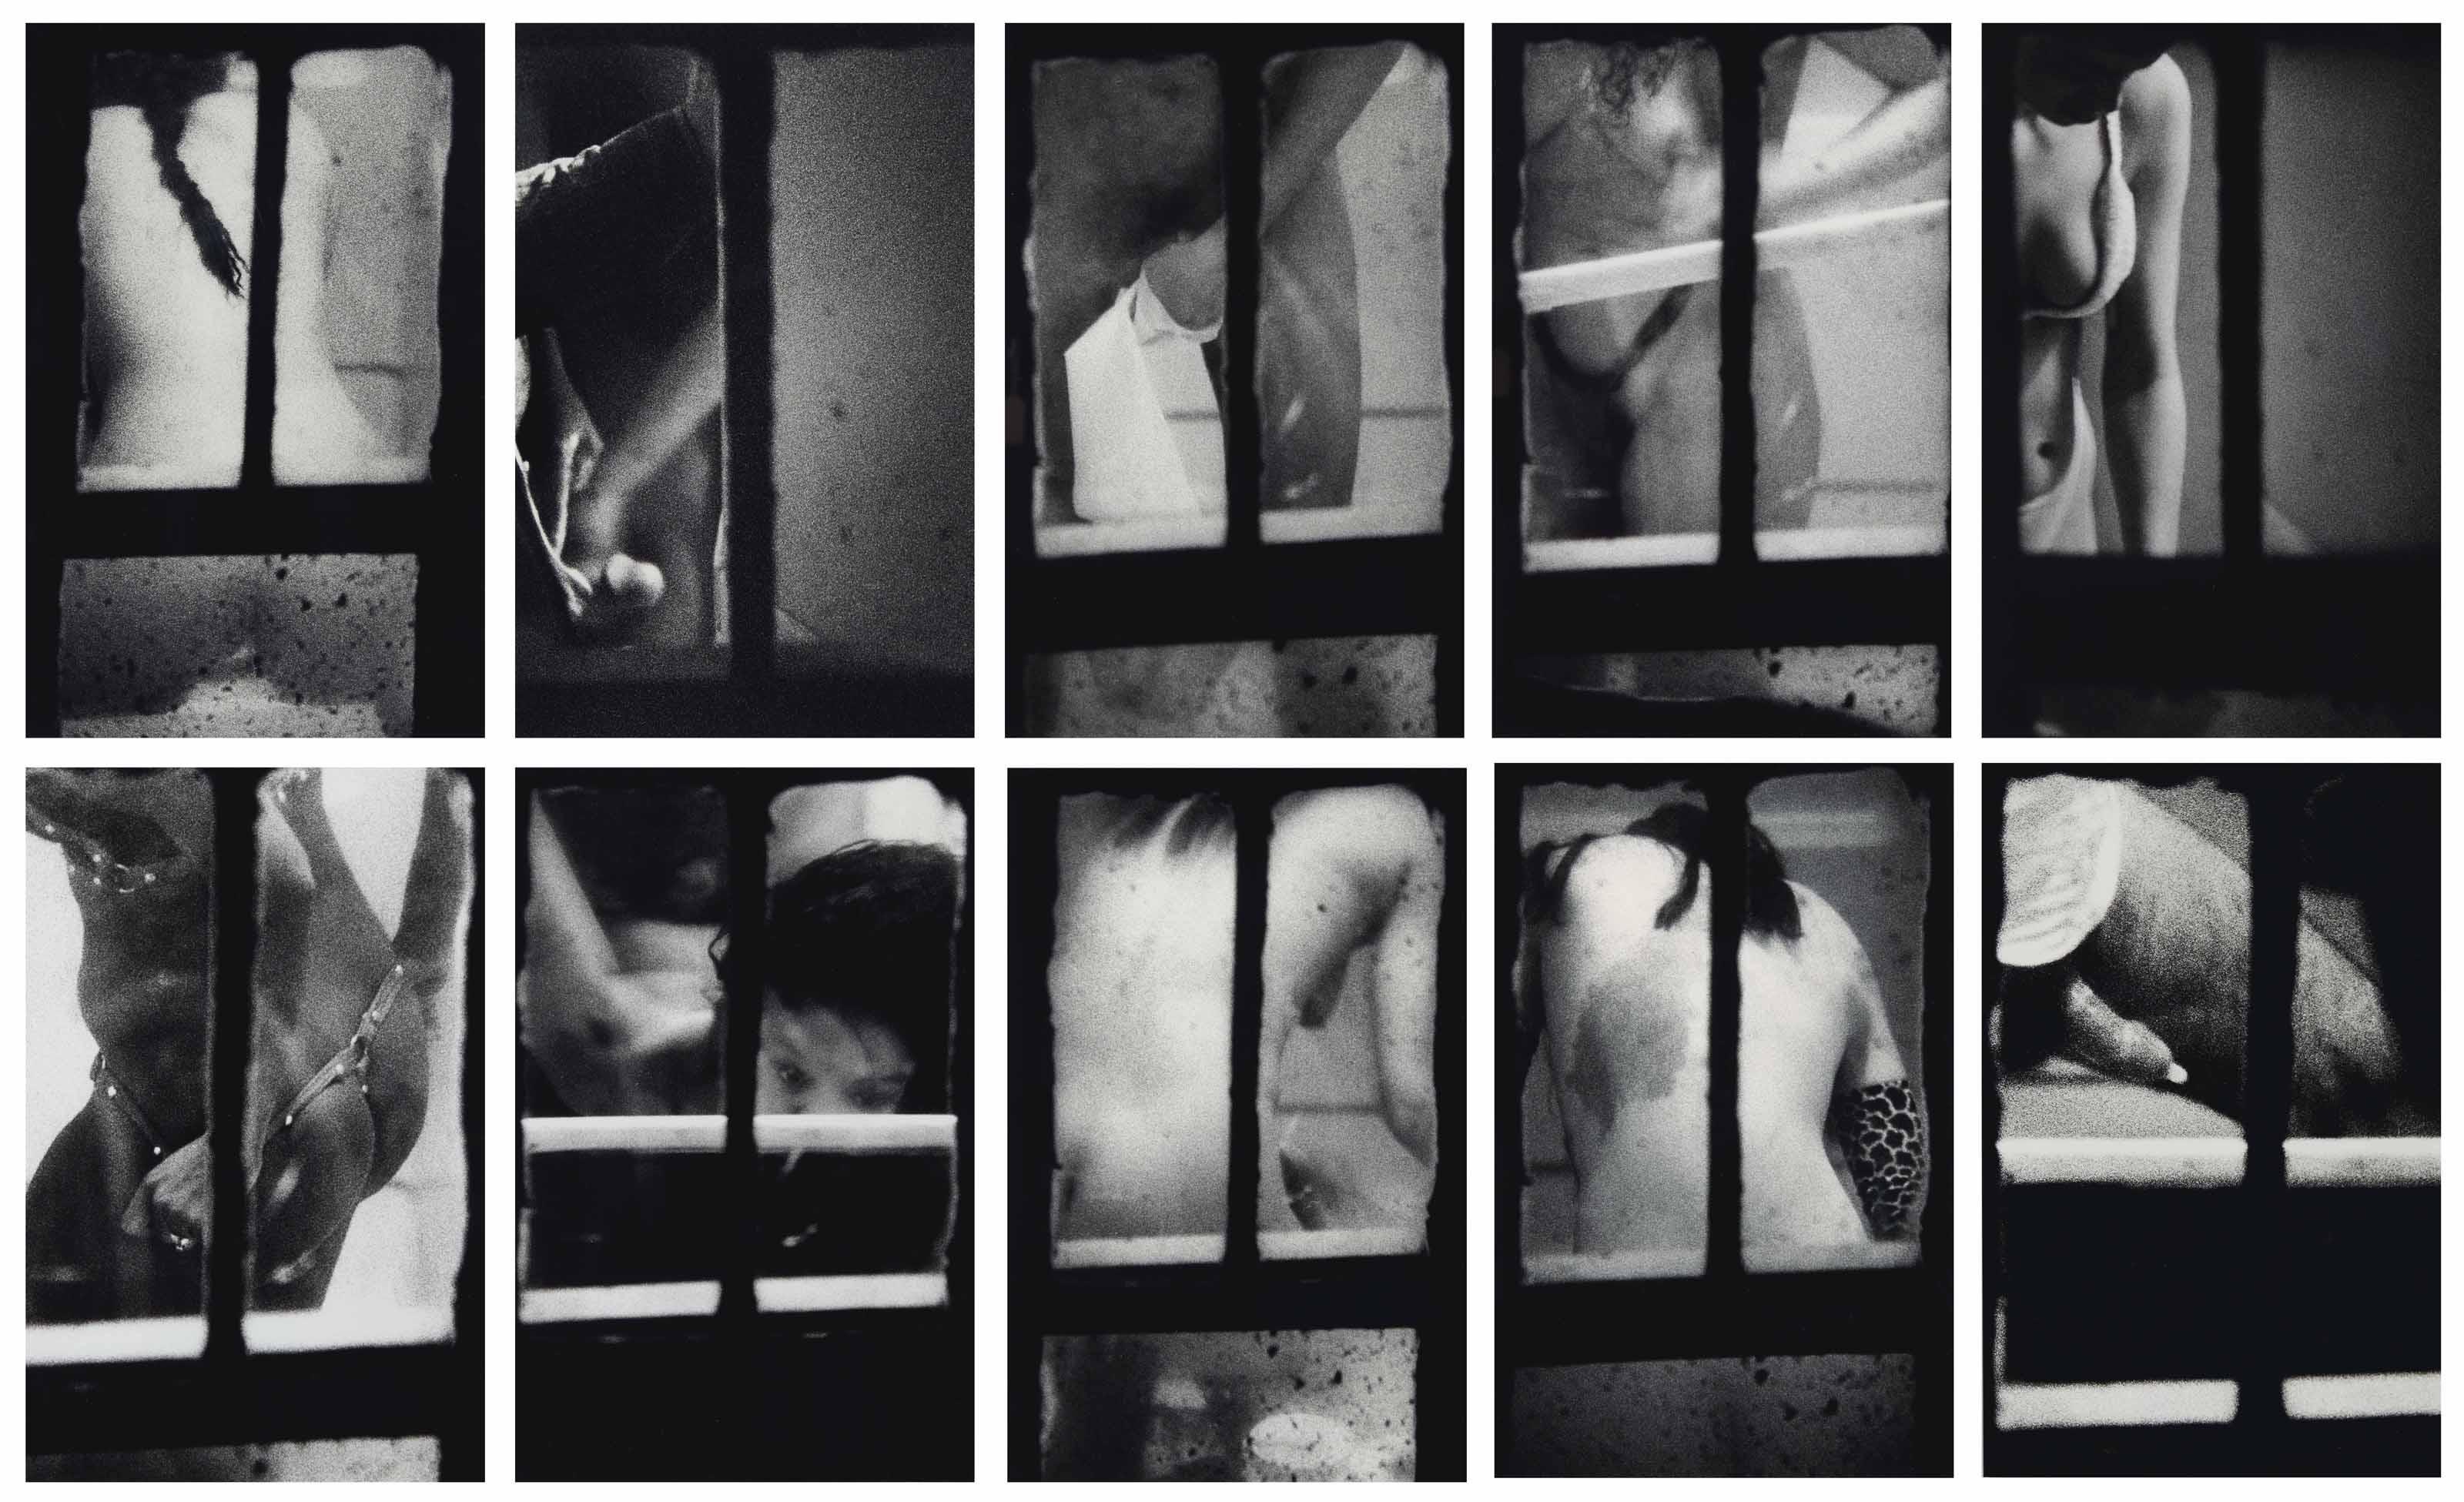 Untitled, de la série Dirty Window, 1994